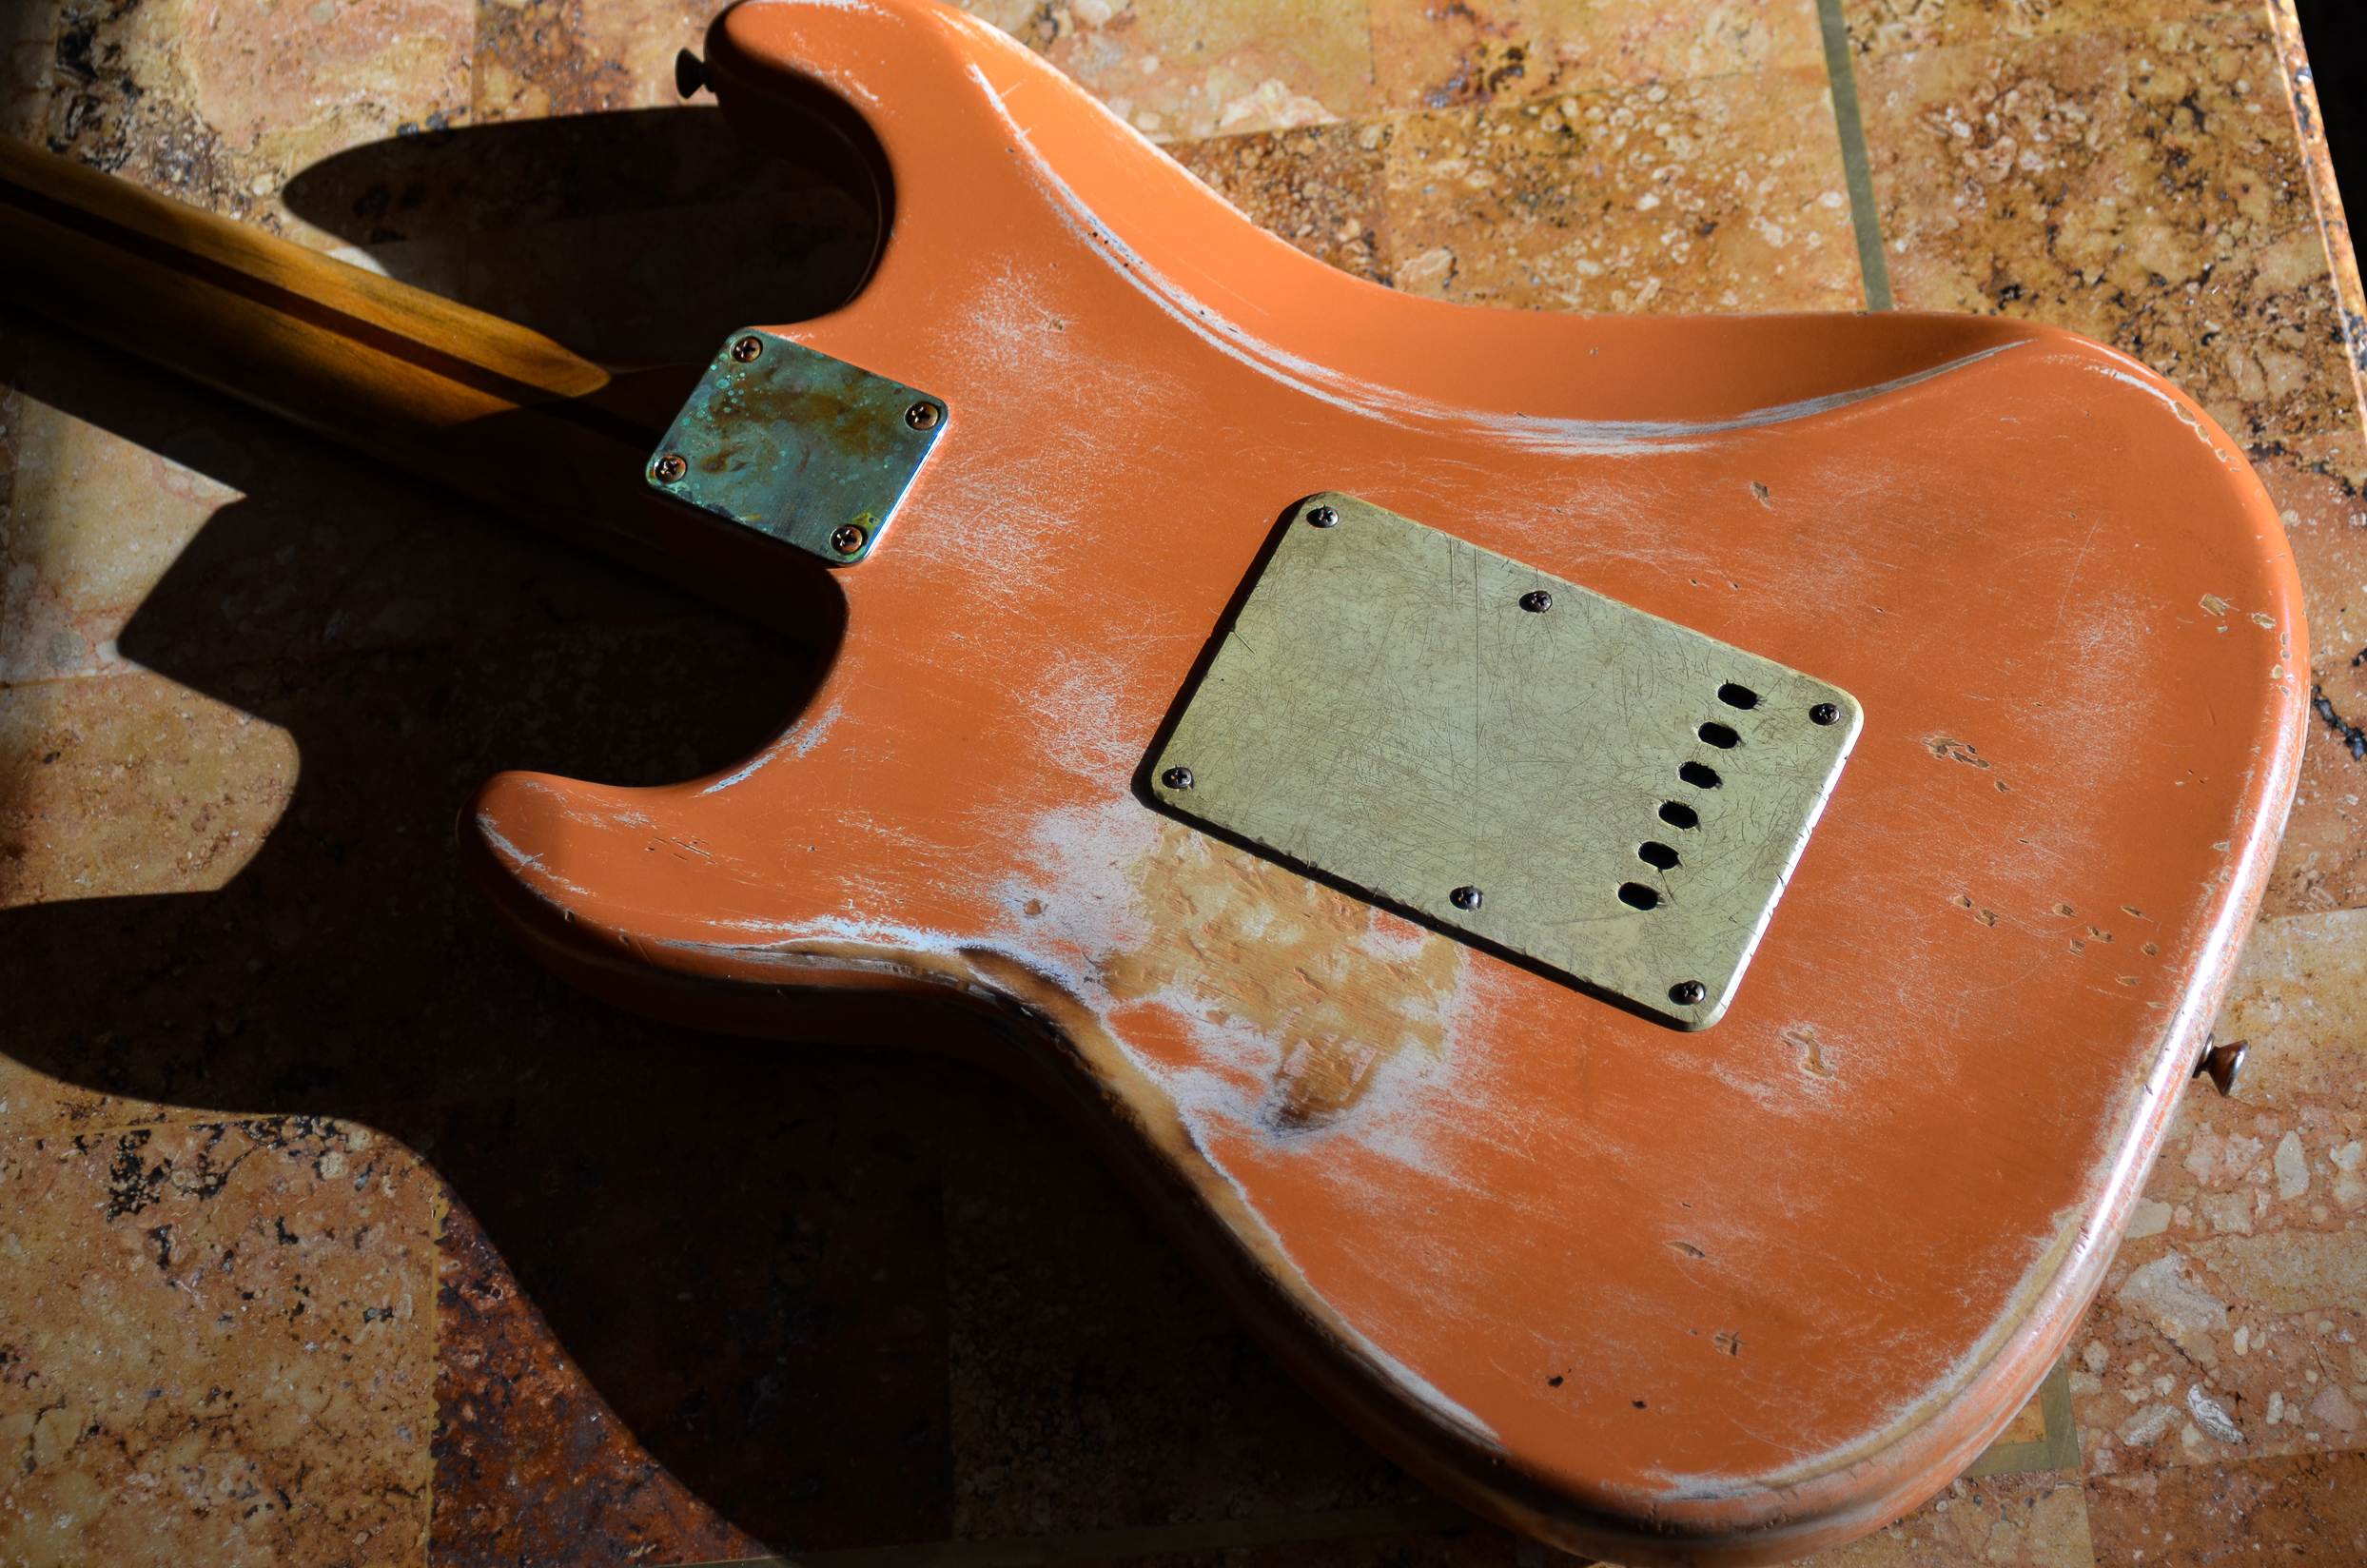 Fender Stratocaster Coral Relic